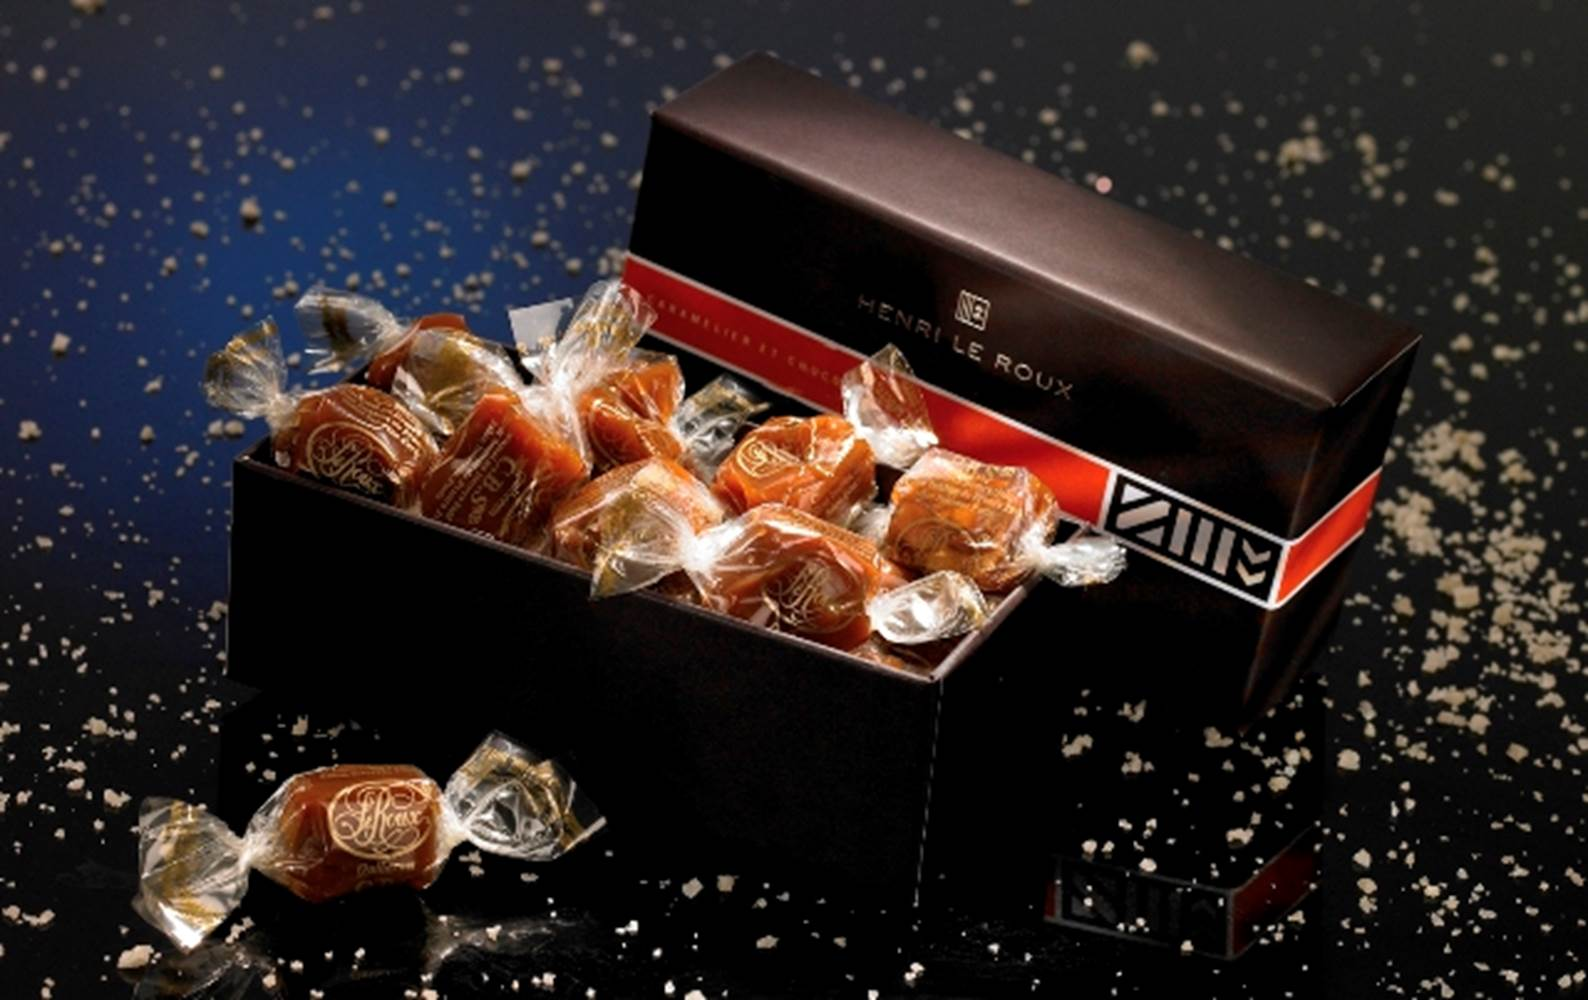 Ballotin chocolat henrie le roux, landevant, Morbihan ©